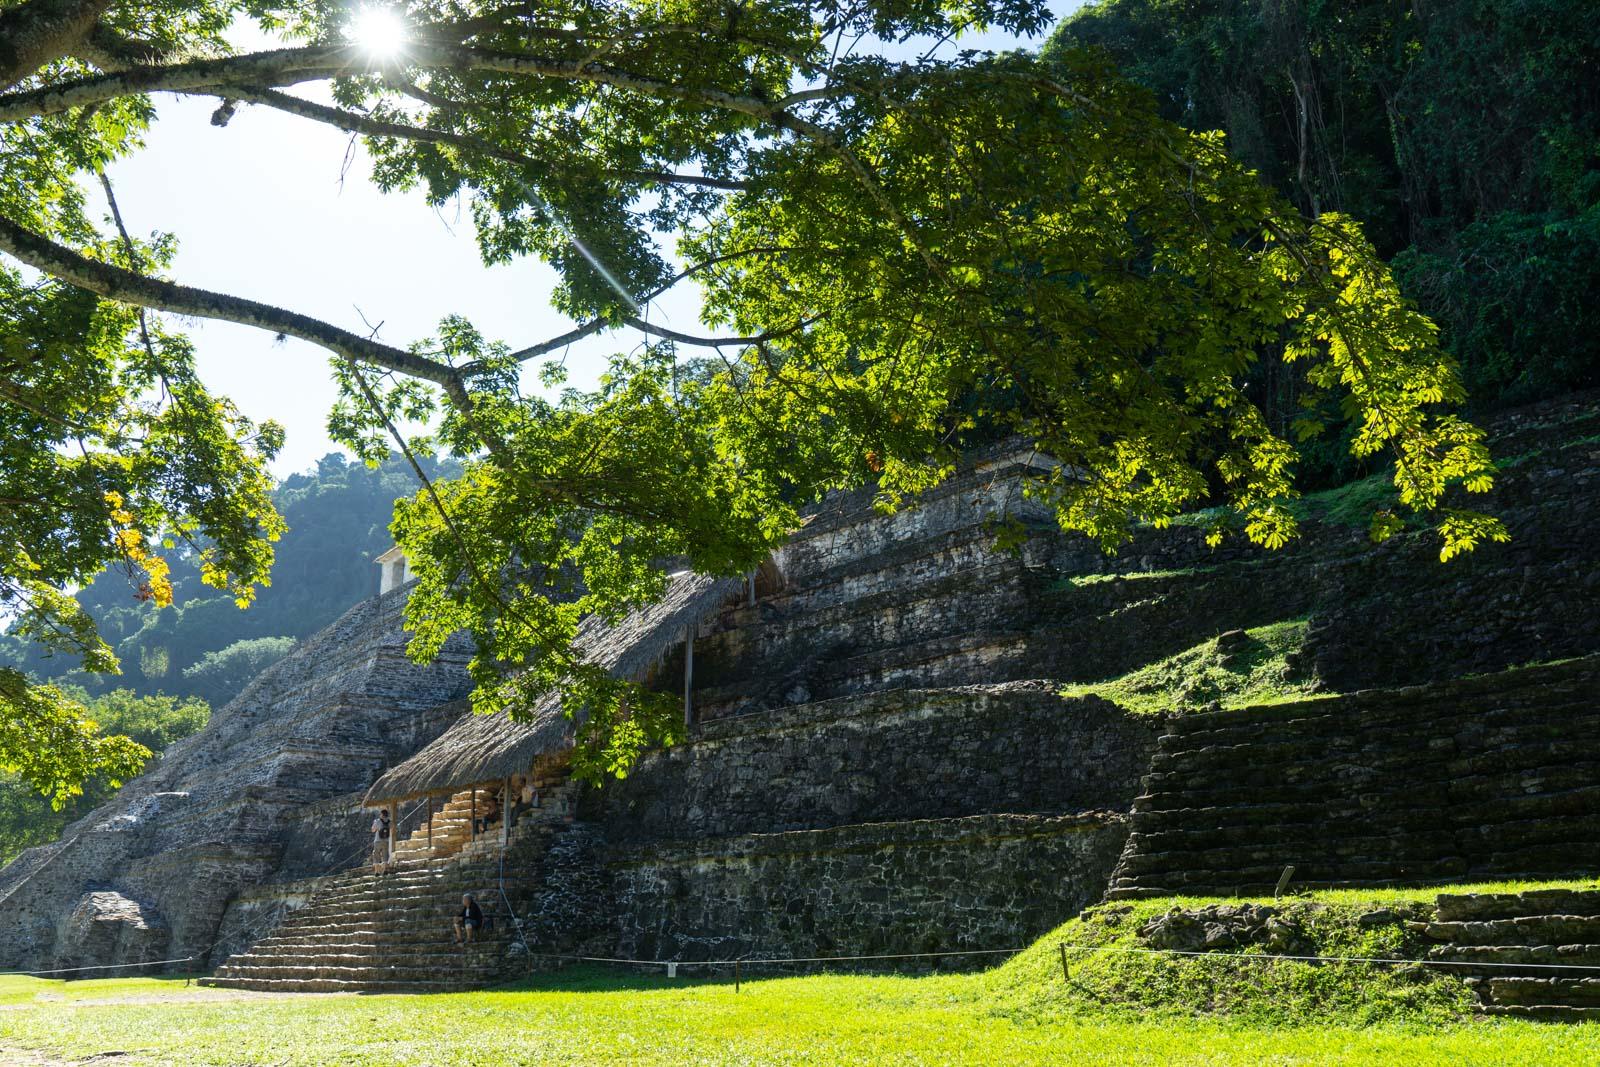 Palenque ruins, Mexico